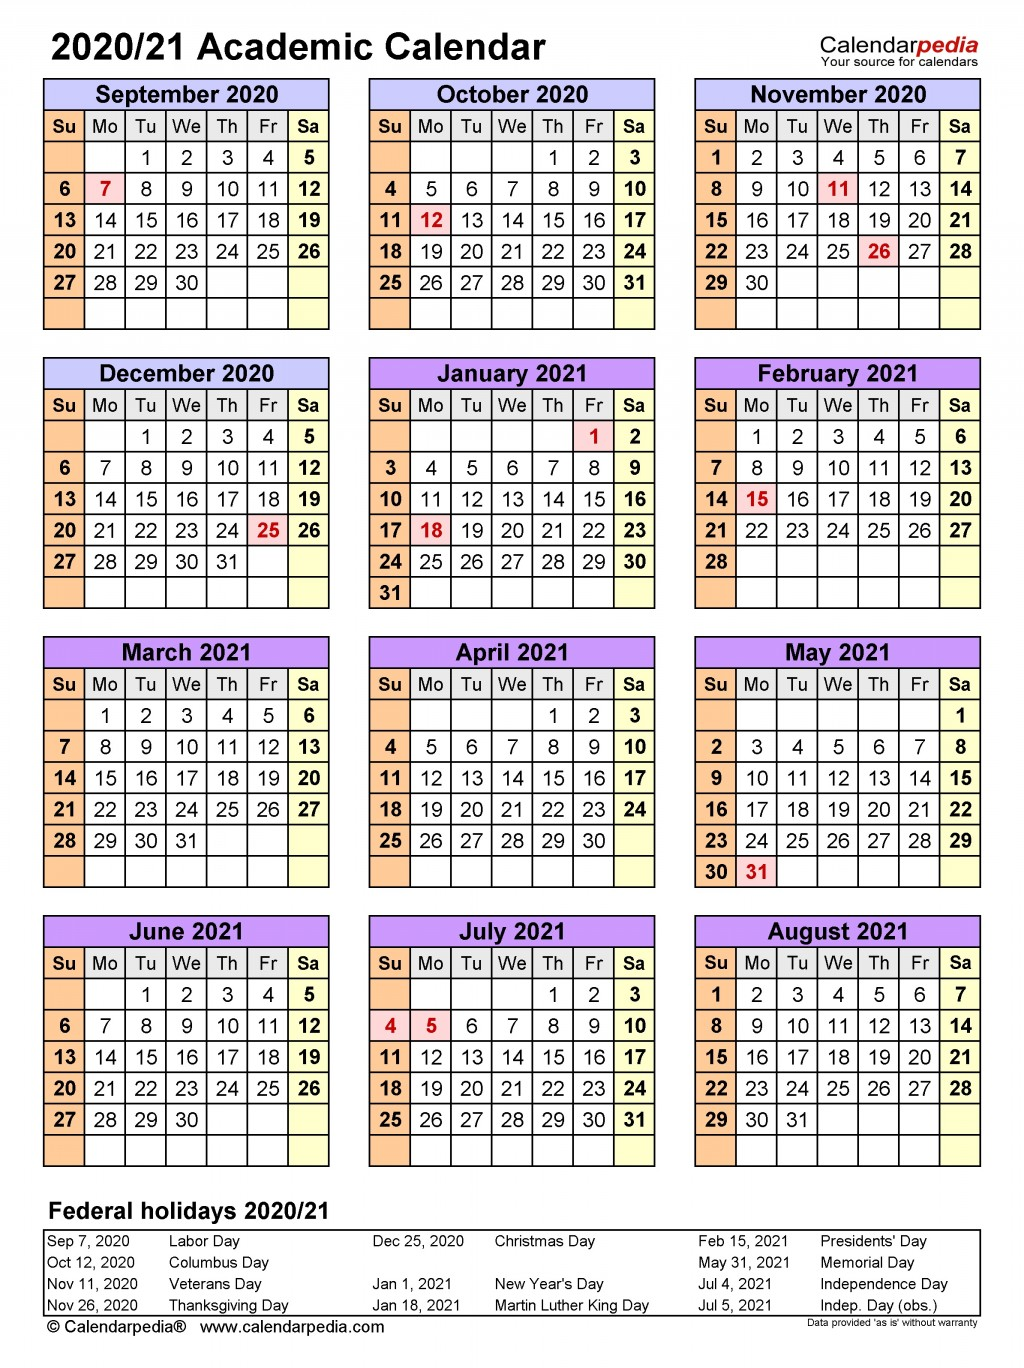 002 Remarkable School Year Calendar Template High Resolution  Excel 2019-20 WordLarge